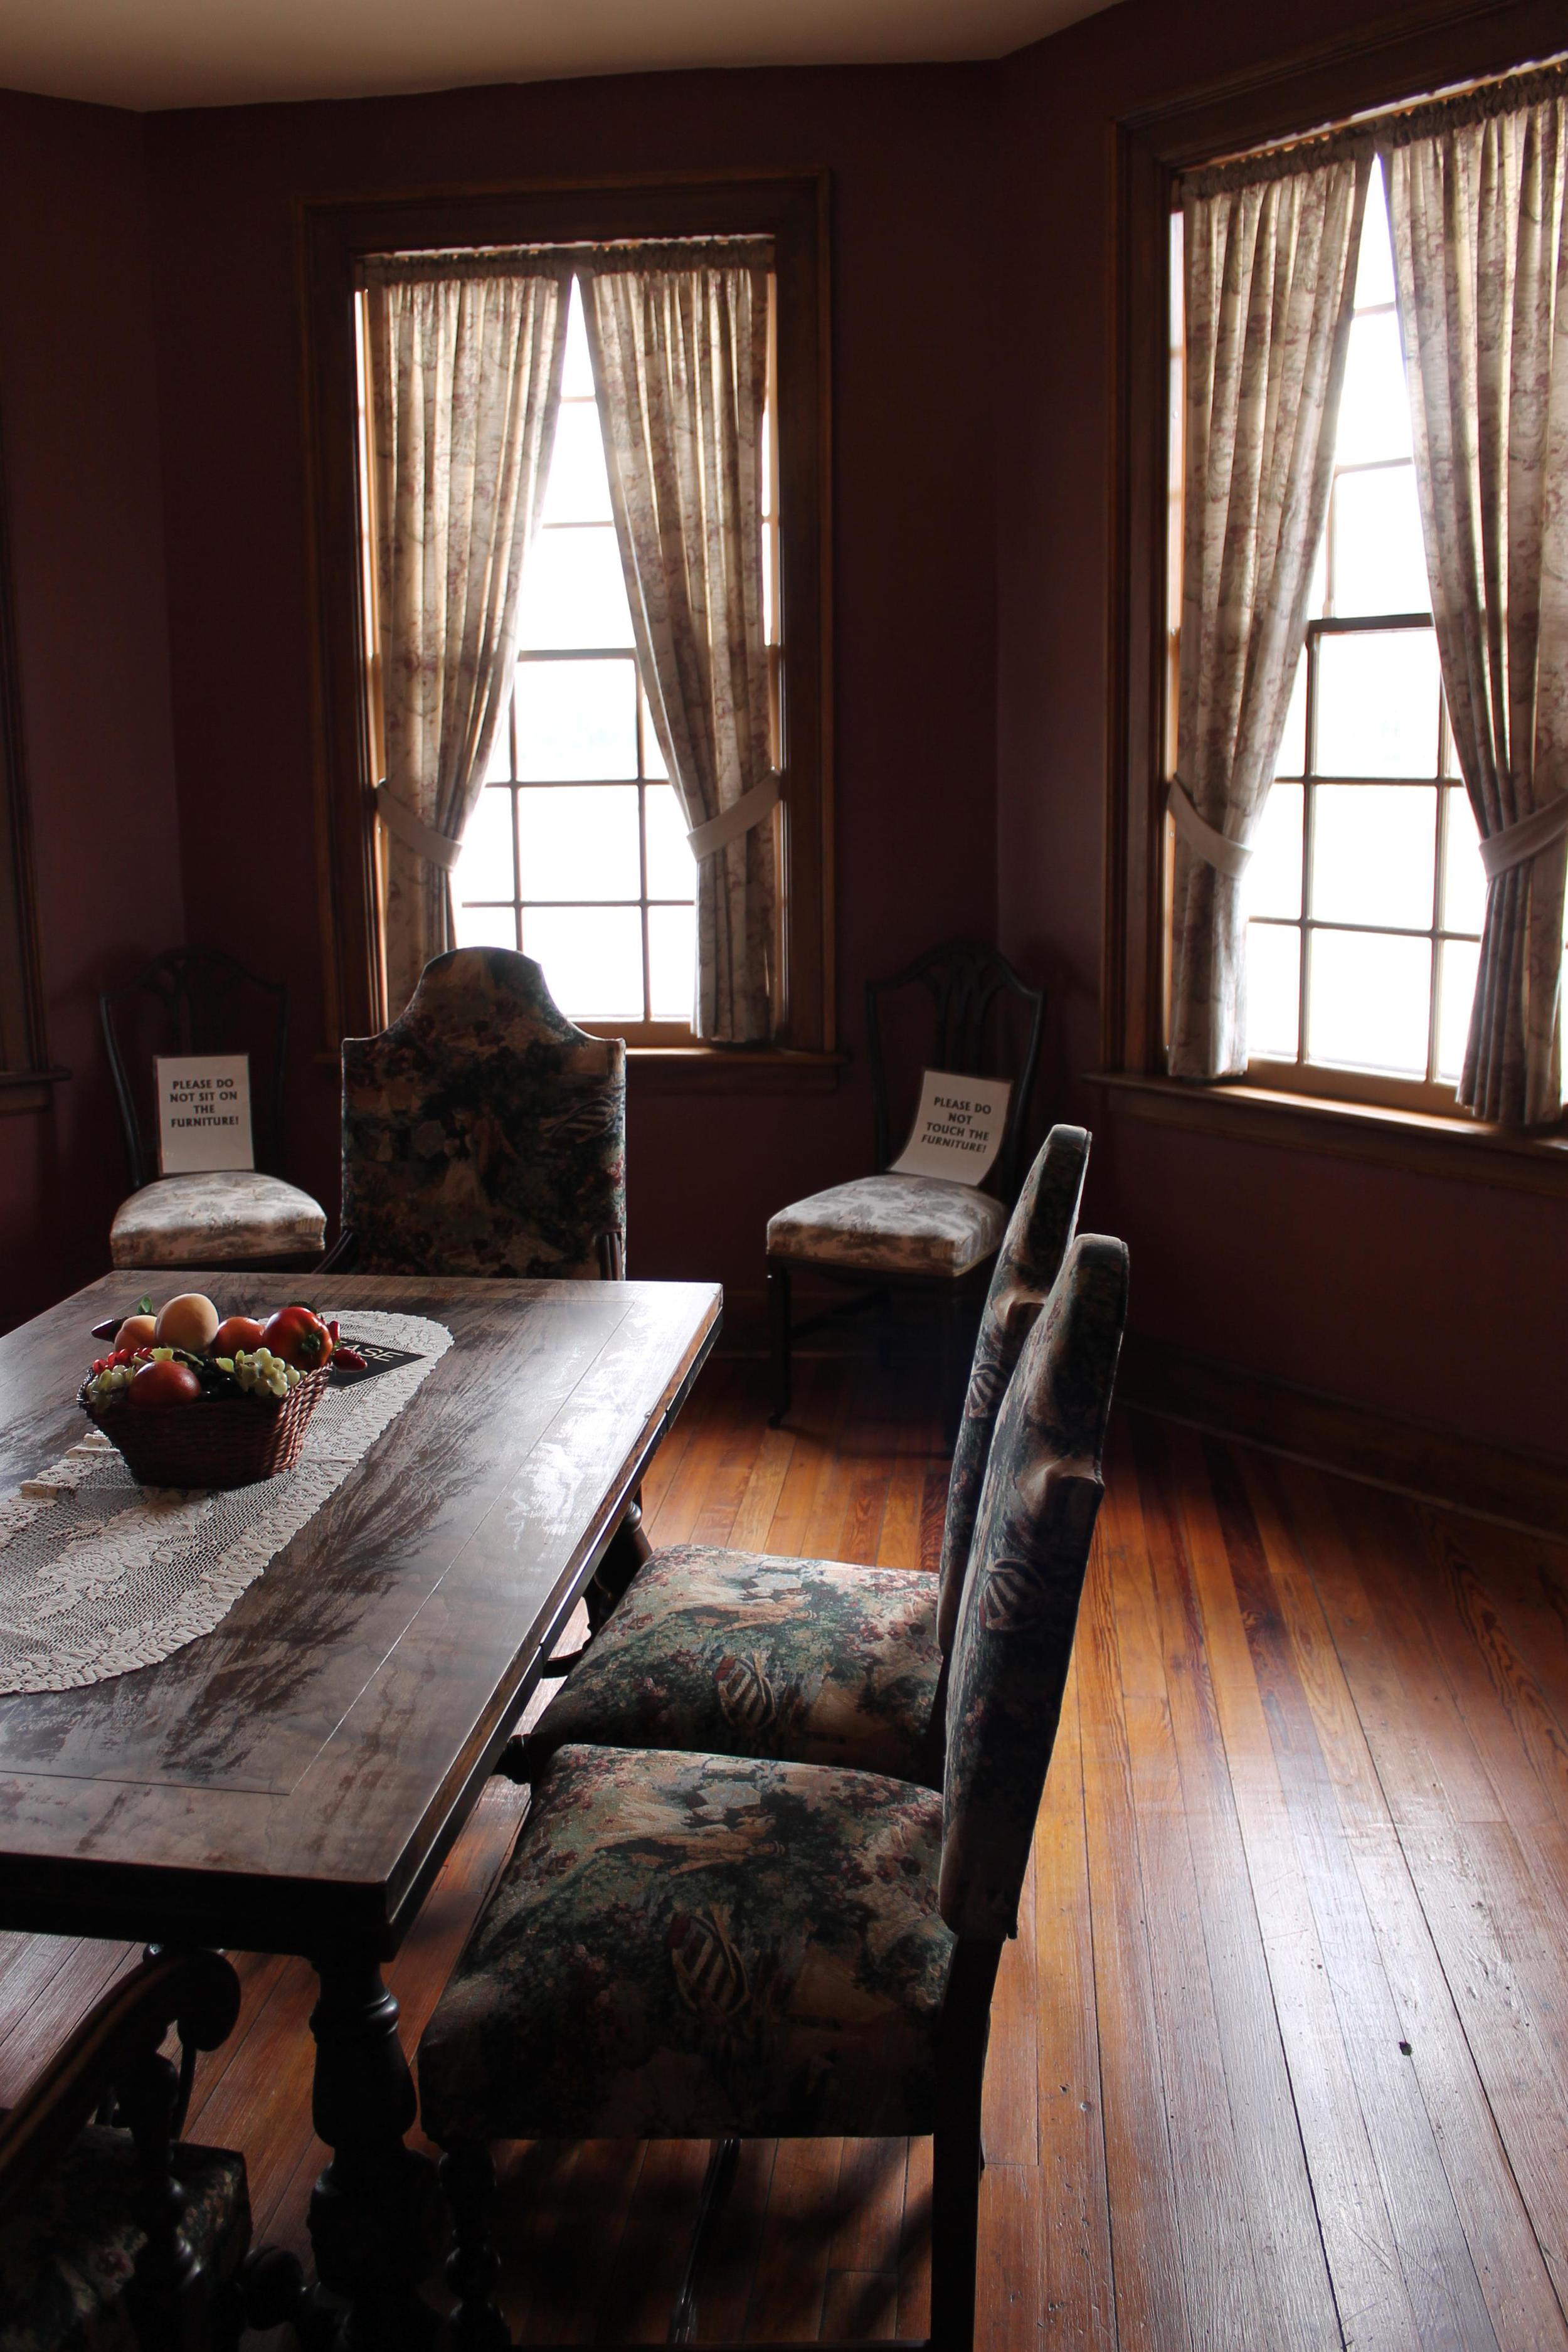 boldt_boathouse_diningroom.JPG